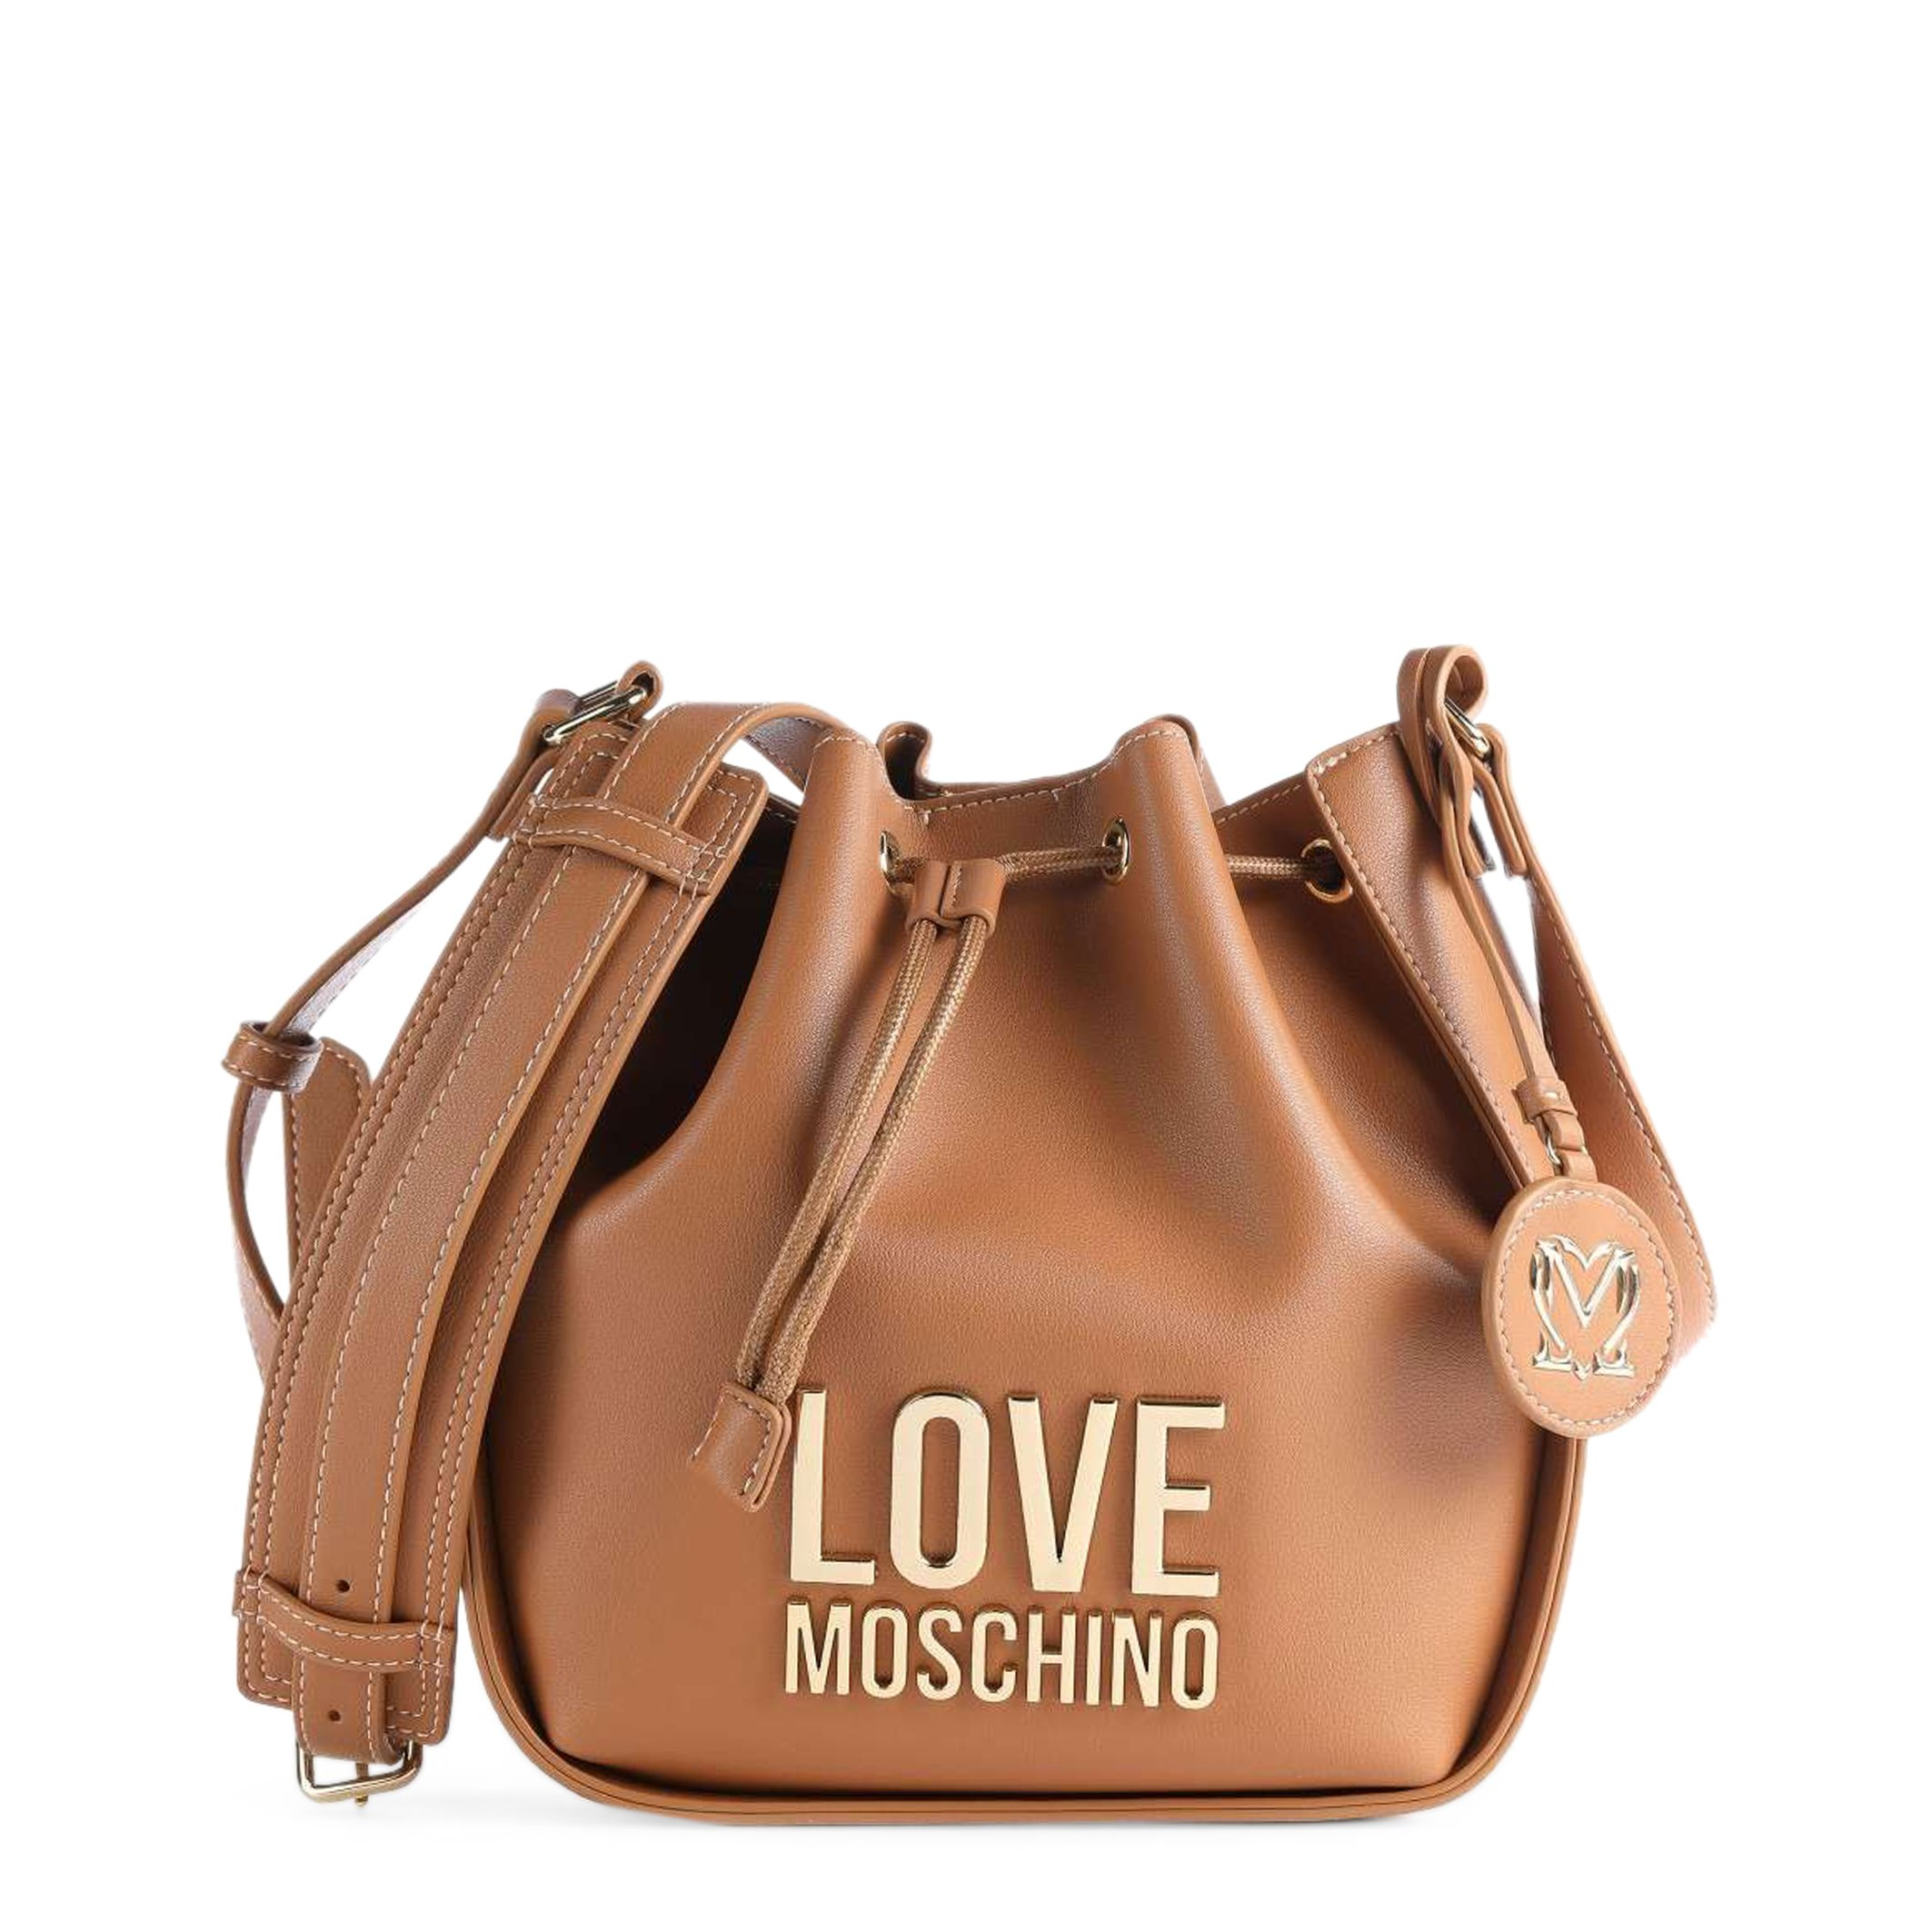 Love Moschino Women's Shoulder Bag Various Colours JC4103PP1DLJ0 - brown NOSIZE